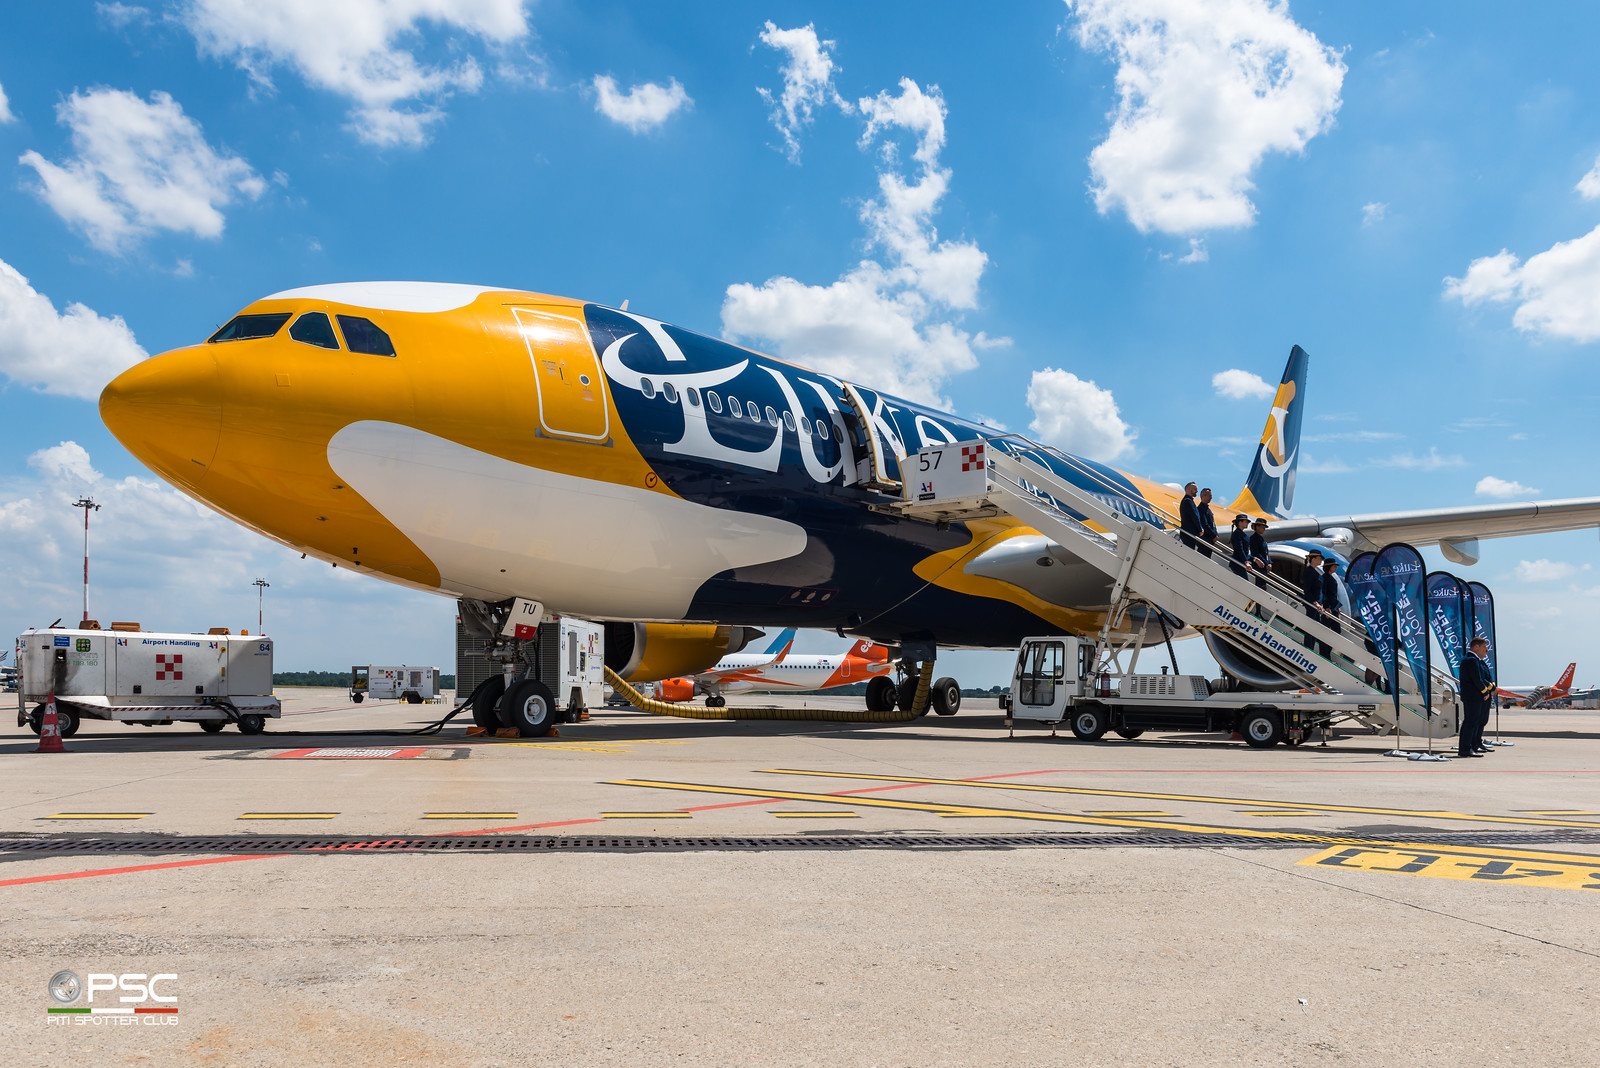 Luke Air (Blue Panorama) presenta il suo nuovo A330